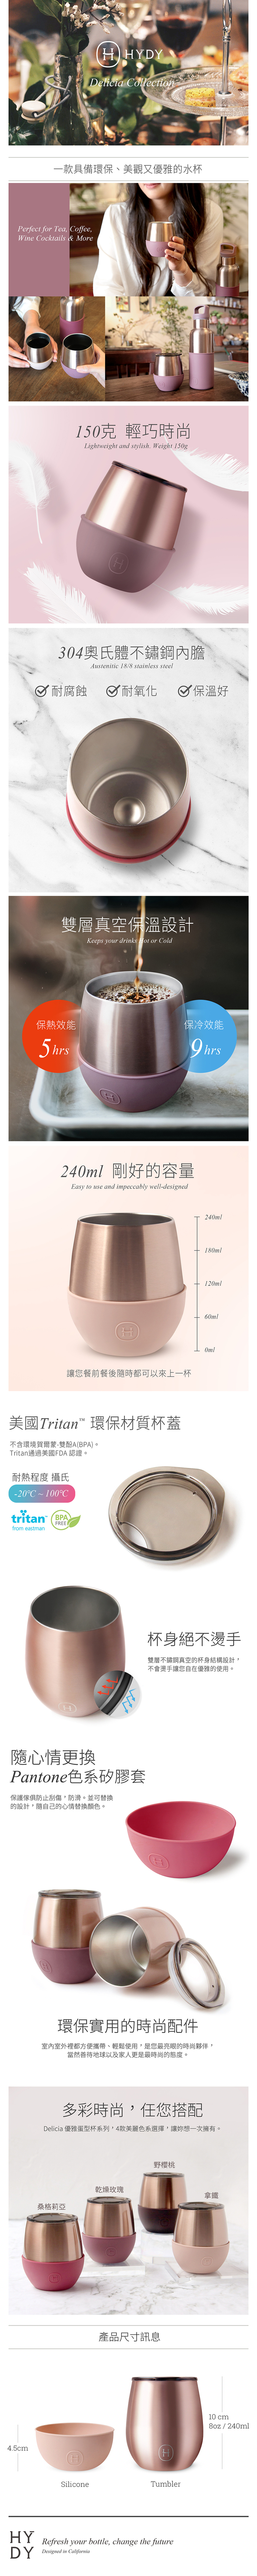 美國HYDY時尚蛋型杯 | CinCin& Delicia-蜜粉金杯瓶組合